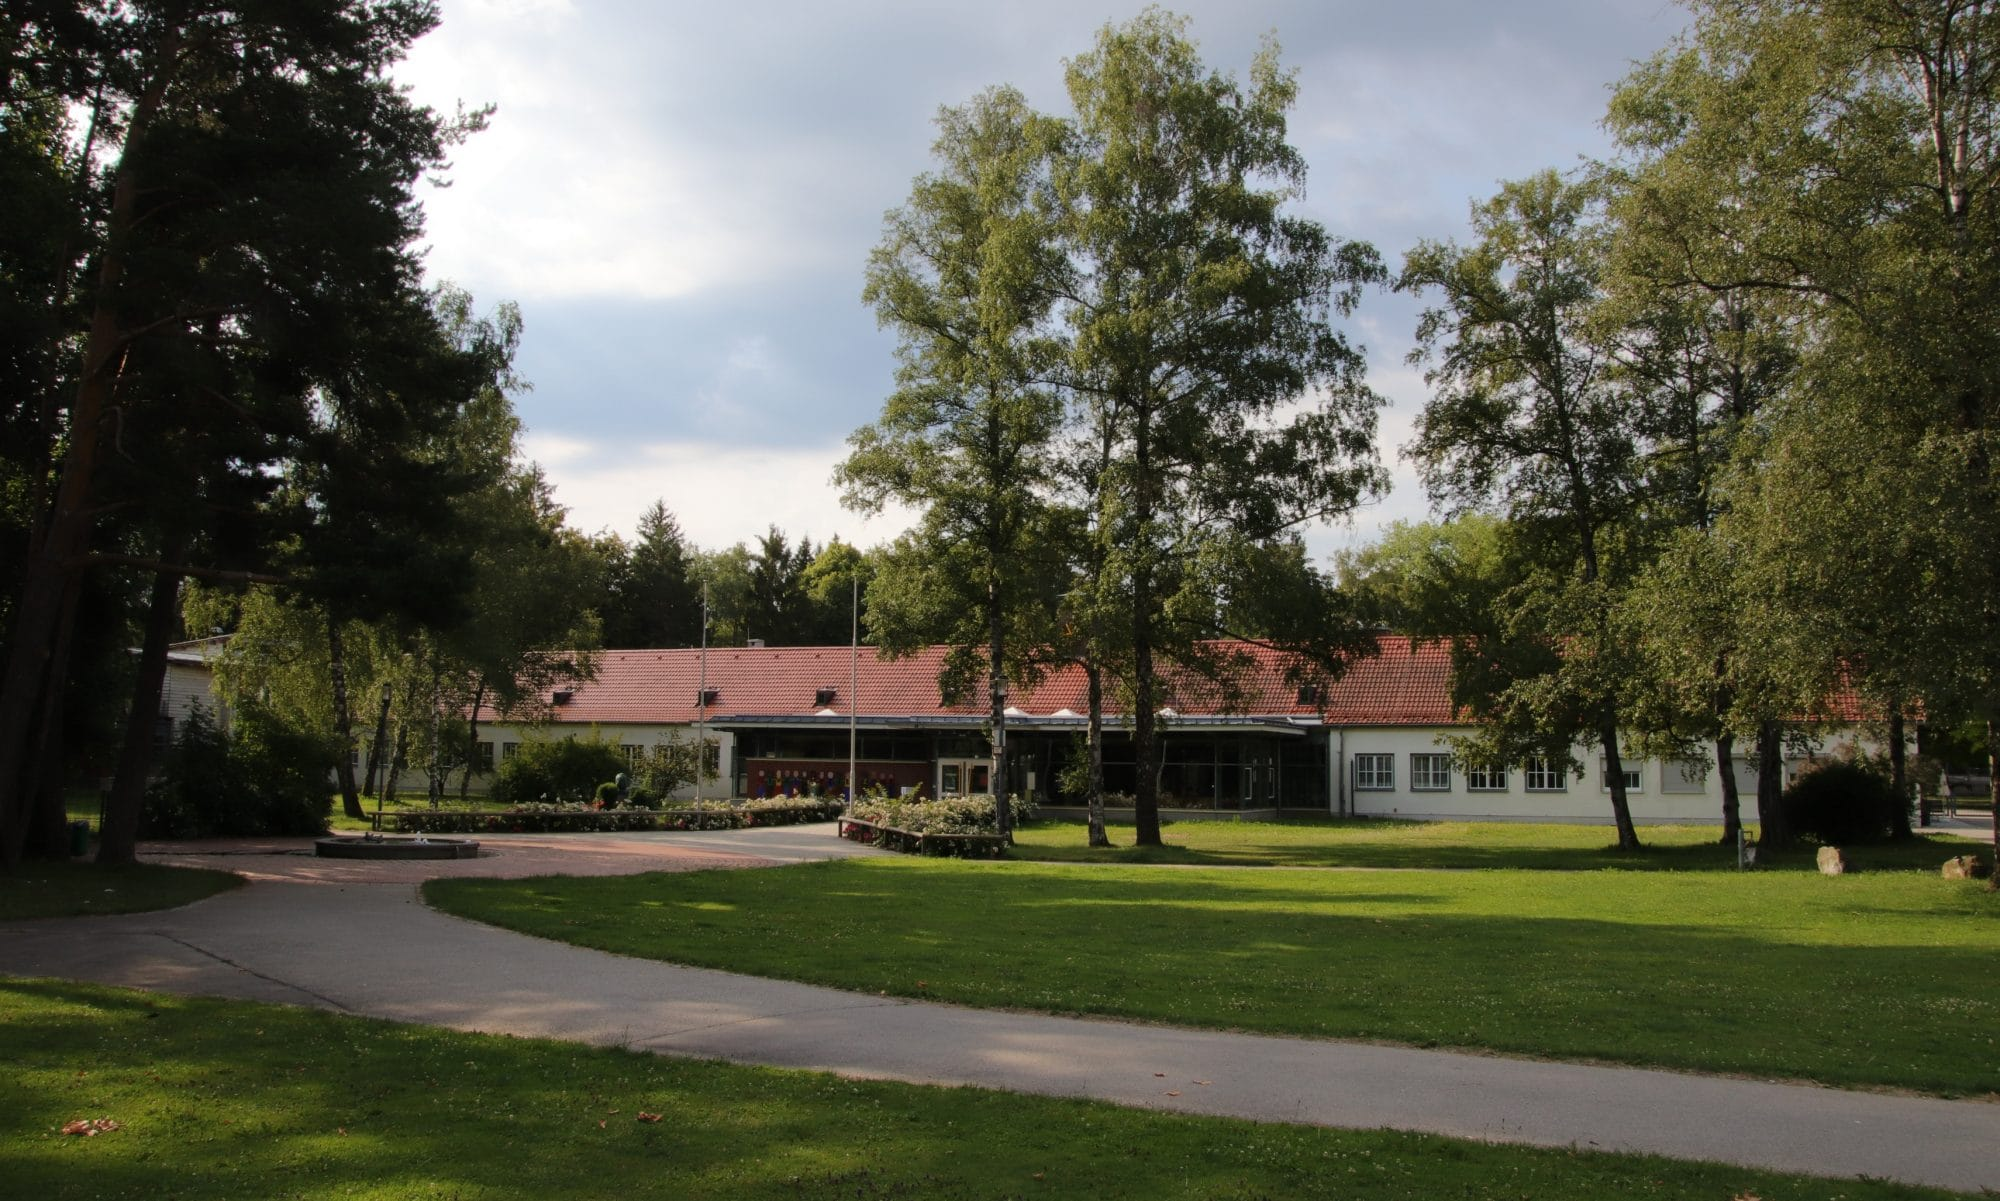 Adalbert-Stifter-Grundschule Kaufbeuren-Neugablonz